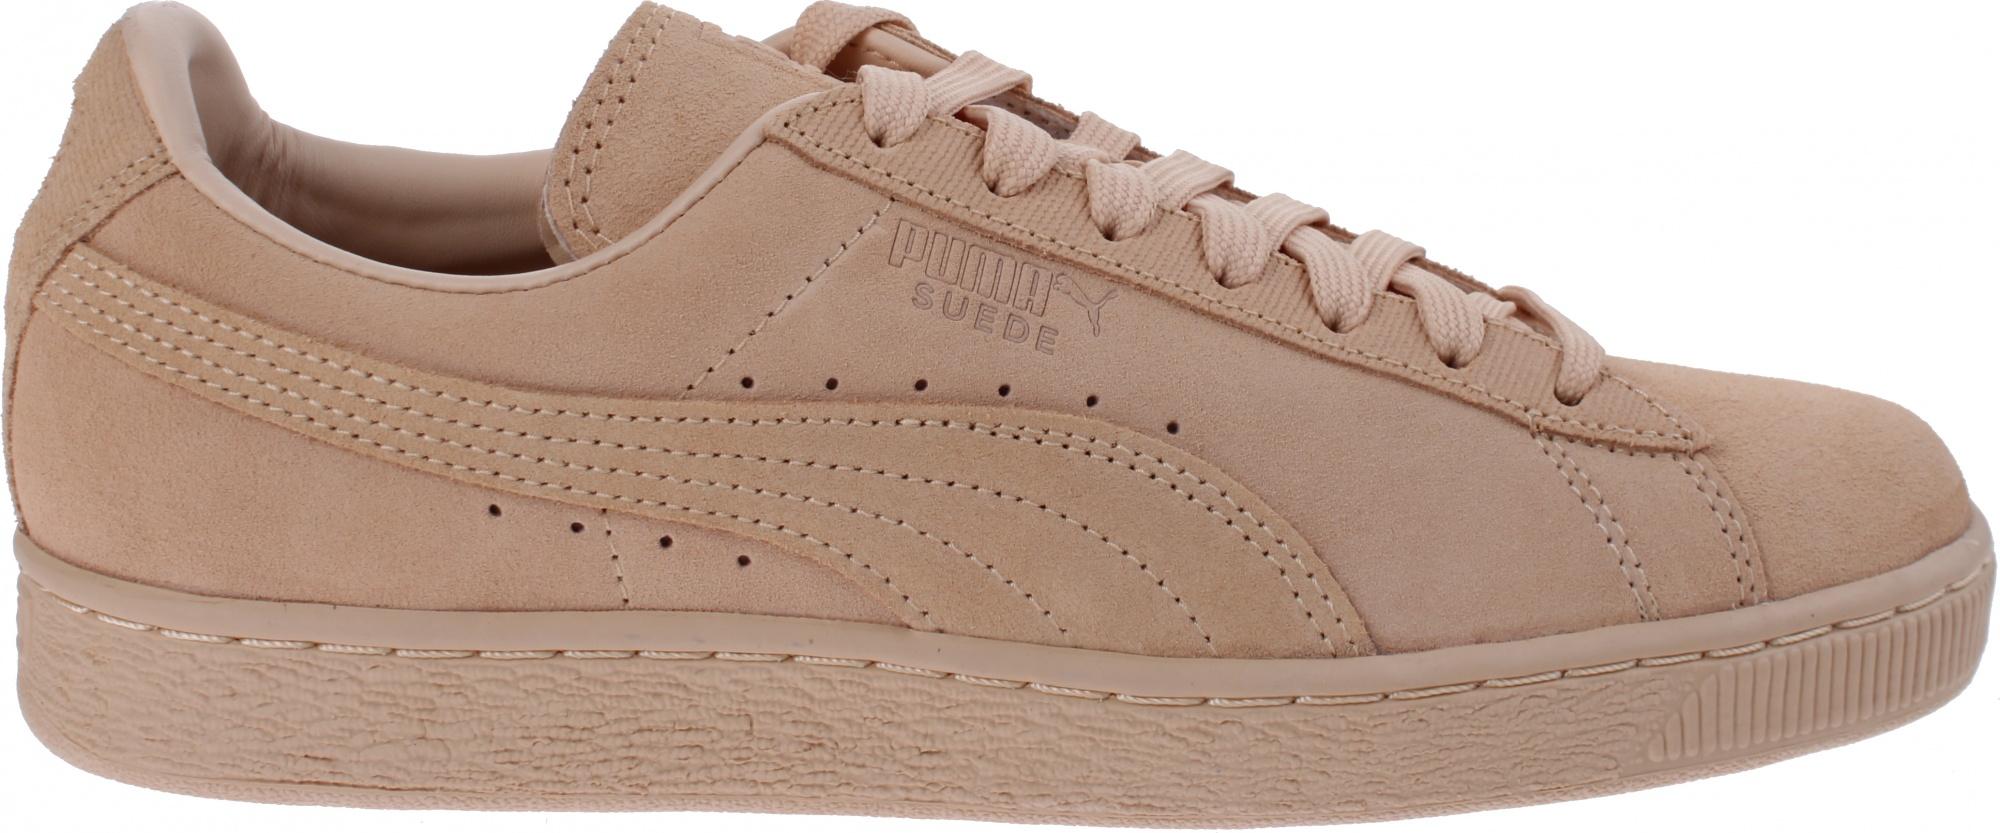 b7bfdb1ec91 Puma sneakers Suede Classic Tonal Natural Vachetta Mens - Internet ...